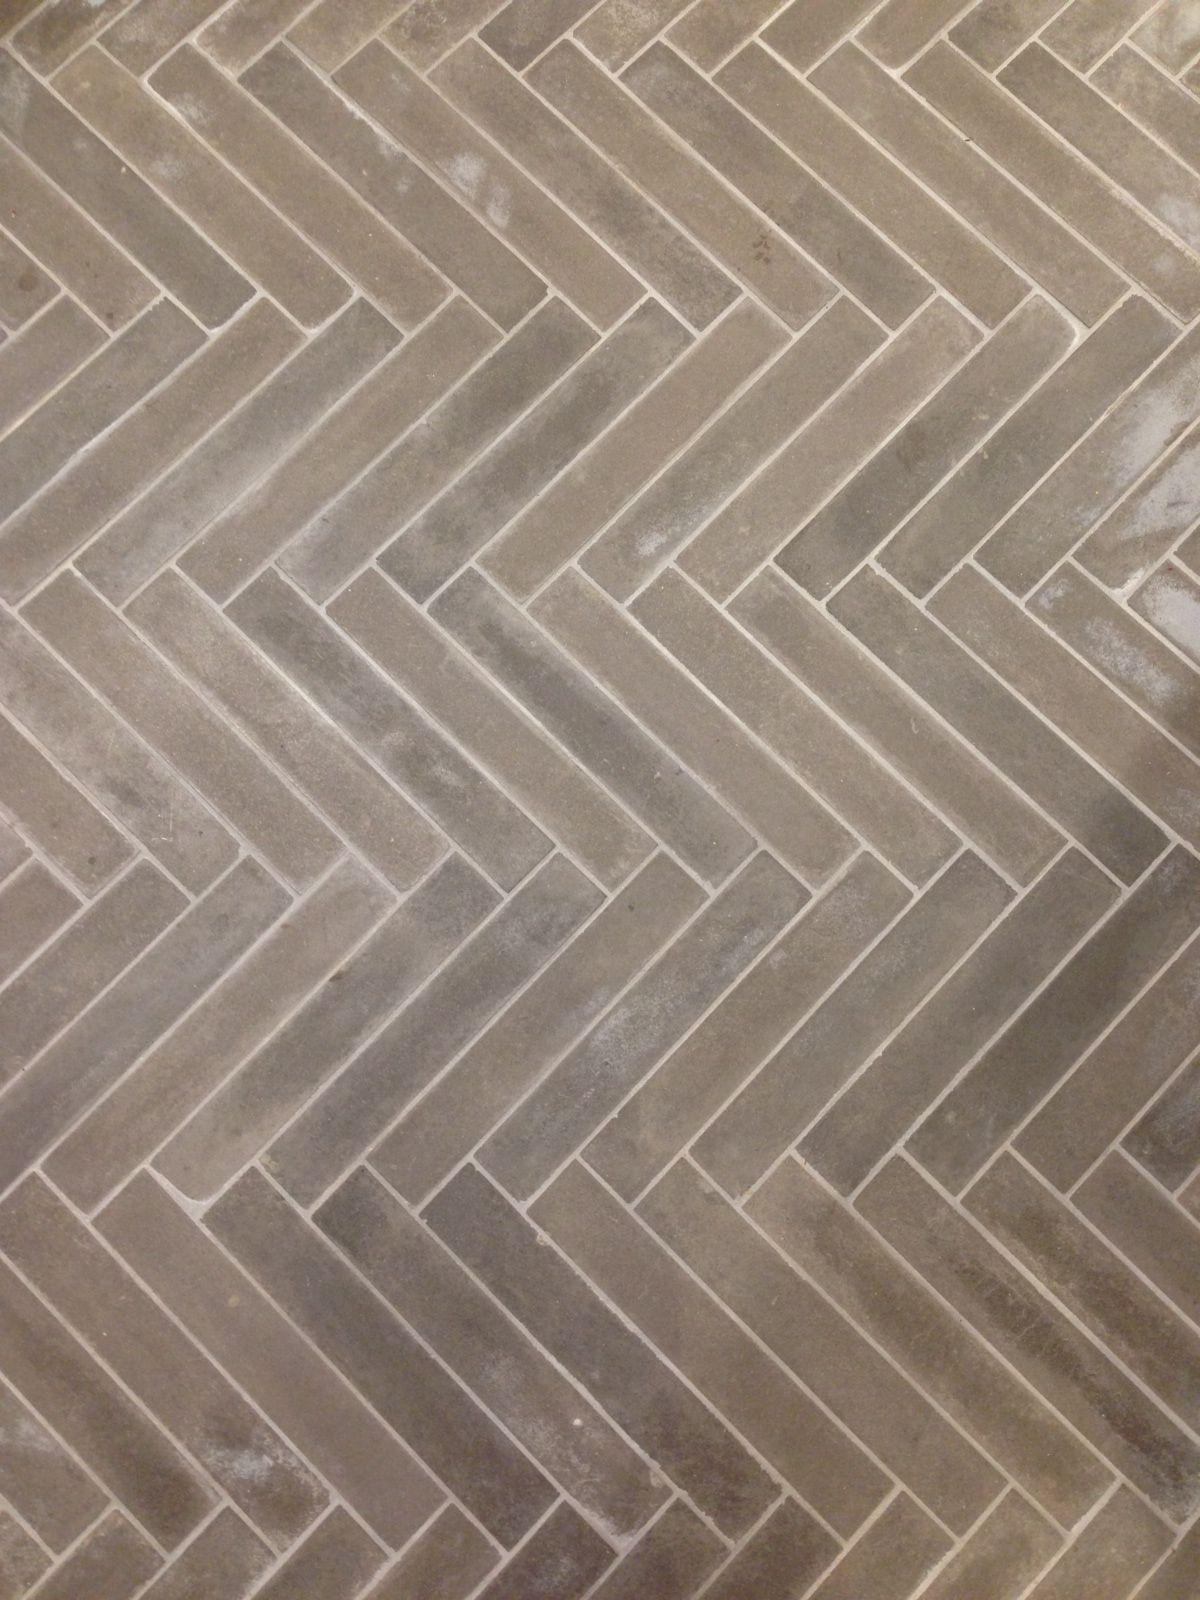 Grey herringbone tile photo of anthropologie floor - Grey bathroom floor tiles texture ...